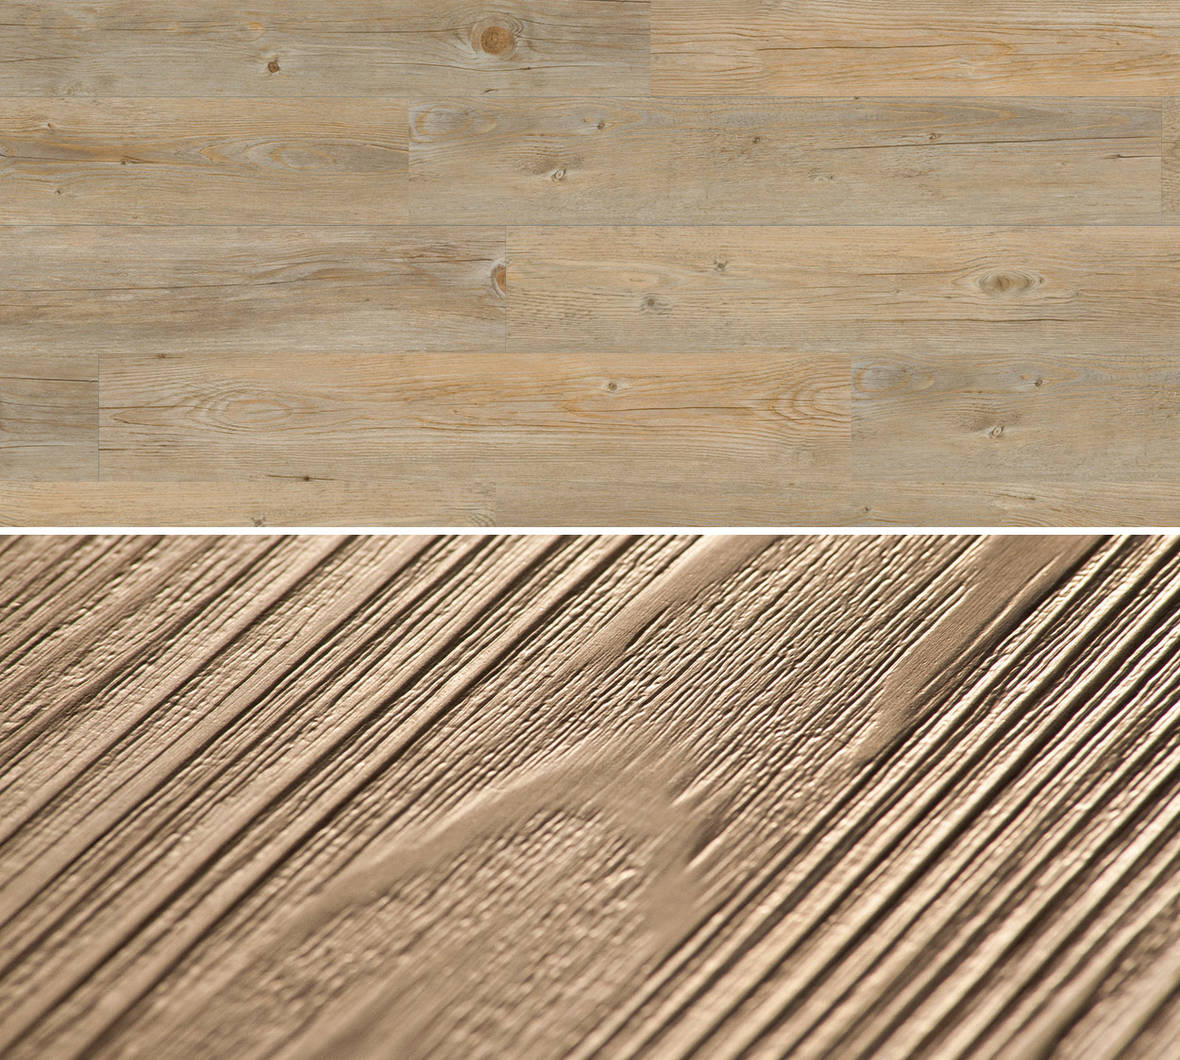 vinylplanken pvc project floors loose lay 55 pw 3020 l5 bodenbel ge einfach online kaufen. Black Bedroom Furniture Sets. Home Design Ideas